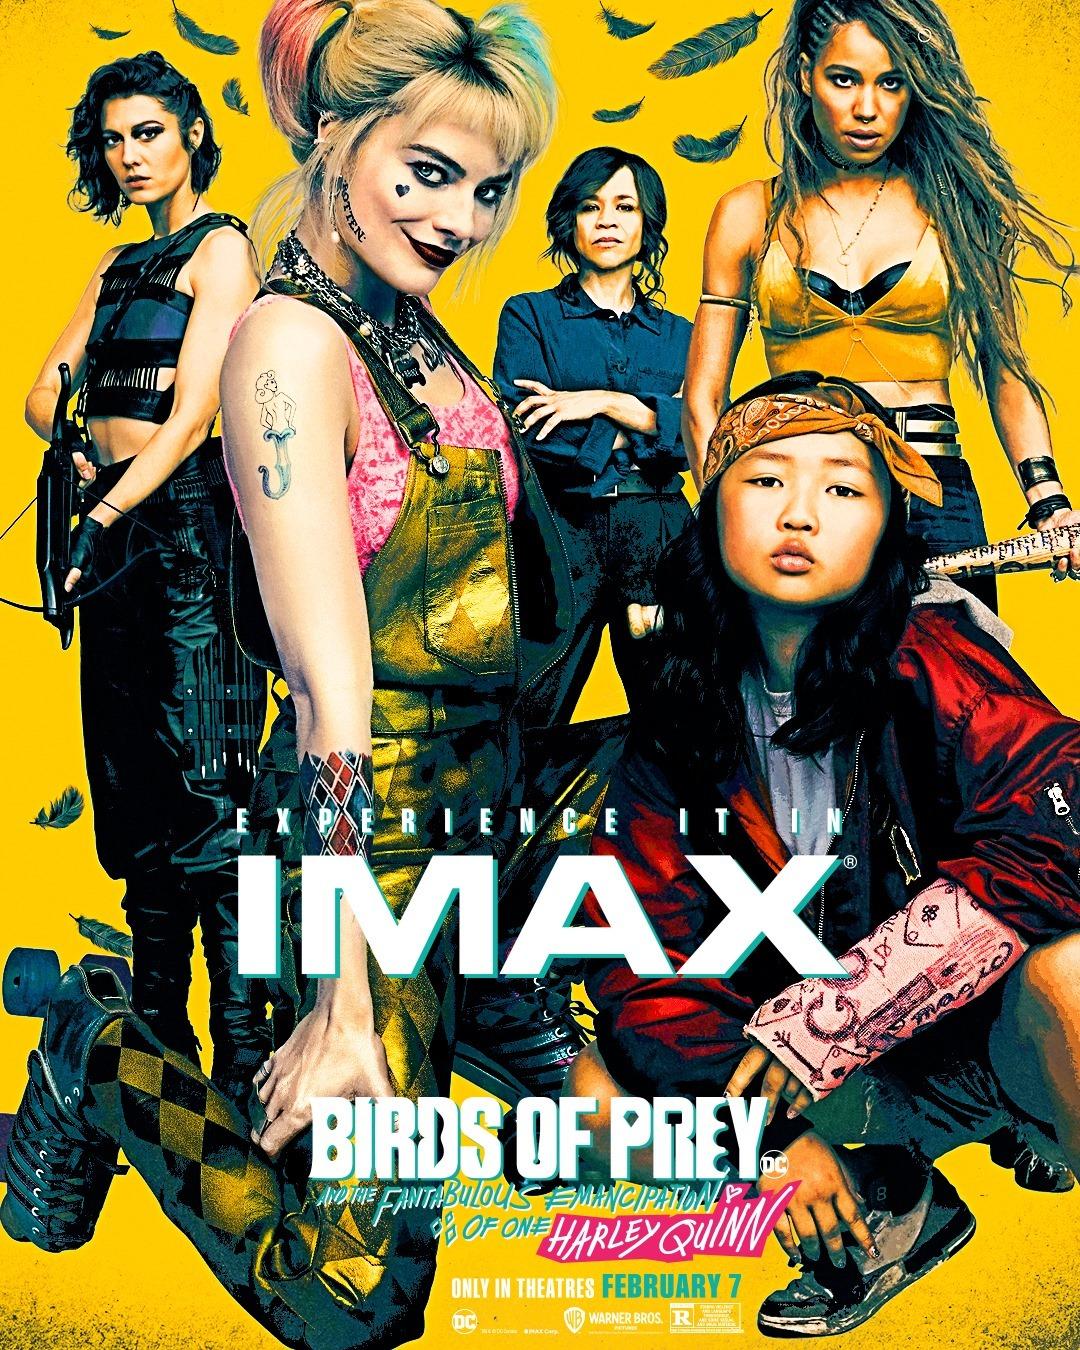 szmk_birds_of_prey_ragadozo_madarak_harley_quinn_csodasztikus_felszabadulasa_dc_batman_gotham_joker_baseball_bruce_17.jpg